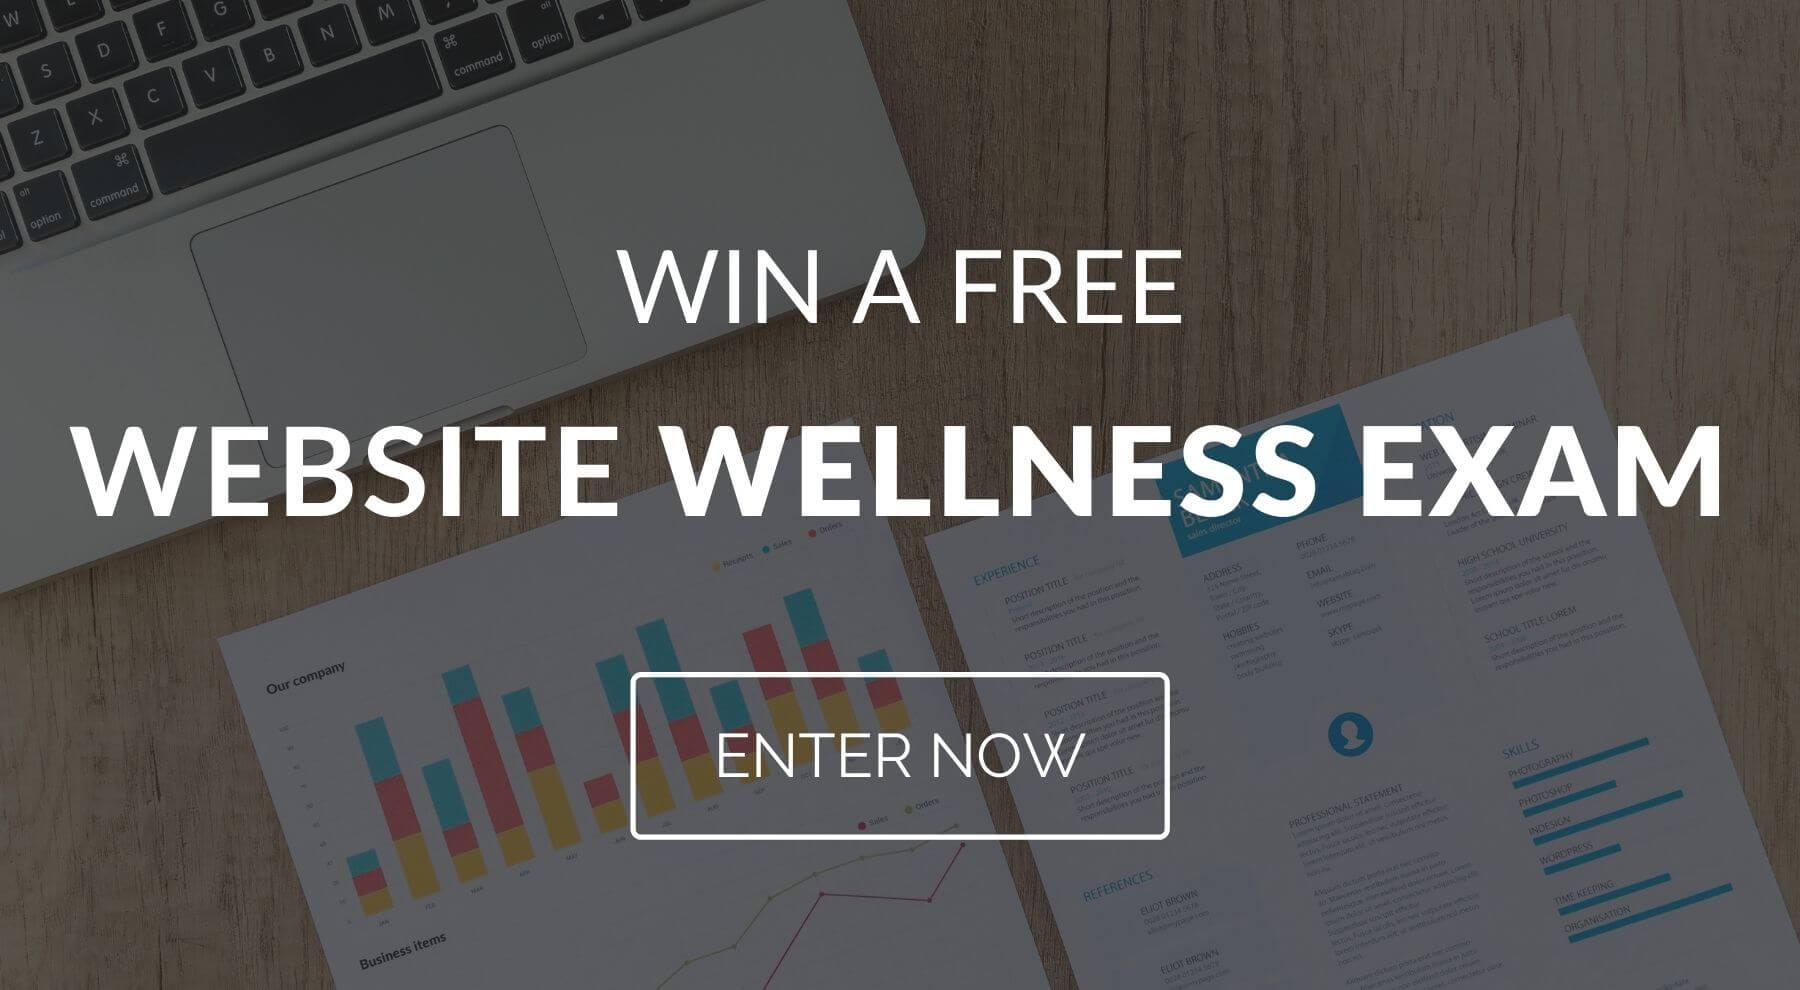 Win a free website wellness exam.